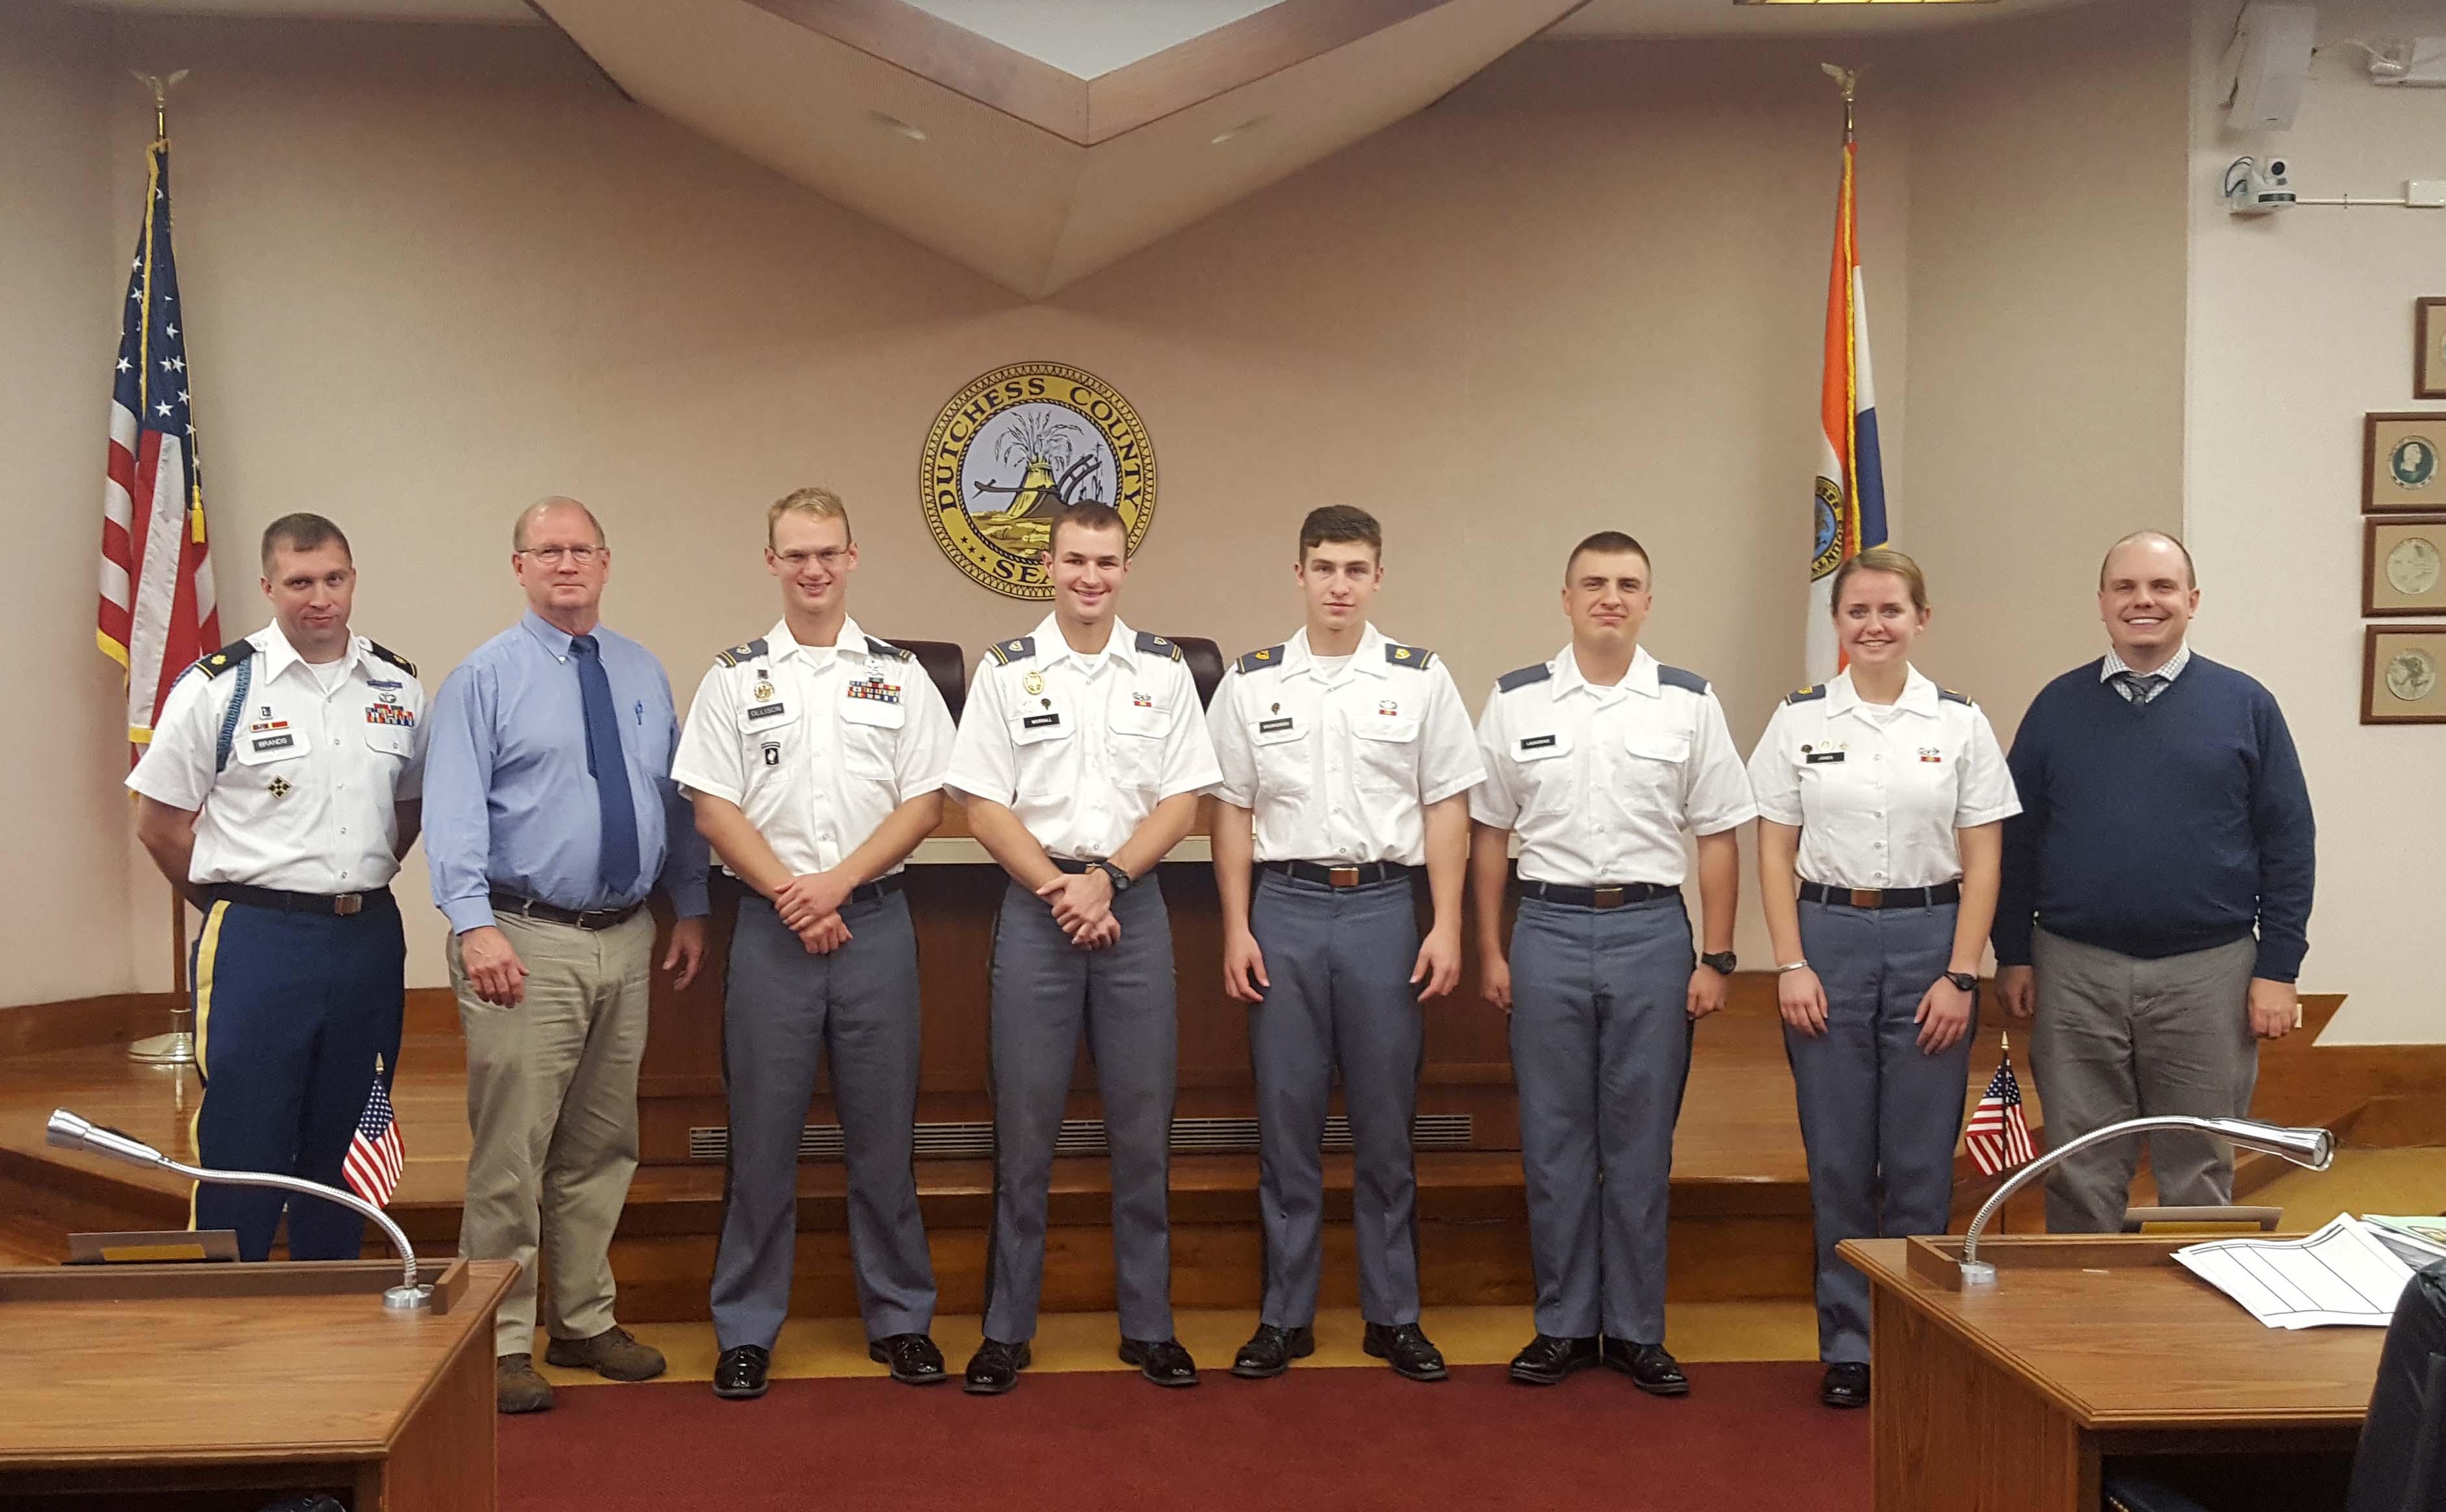 cadet image